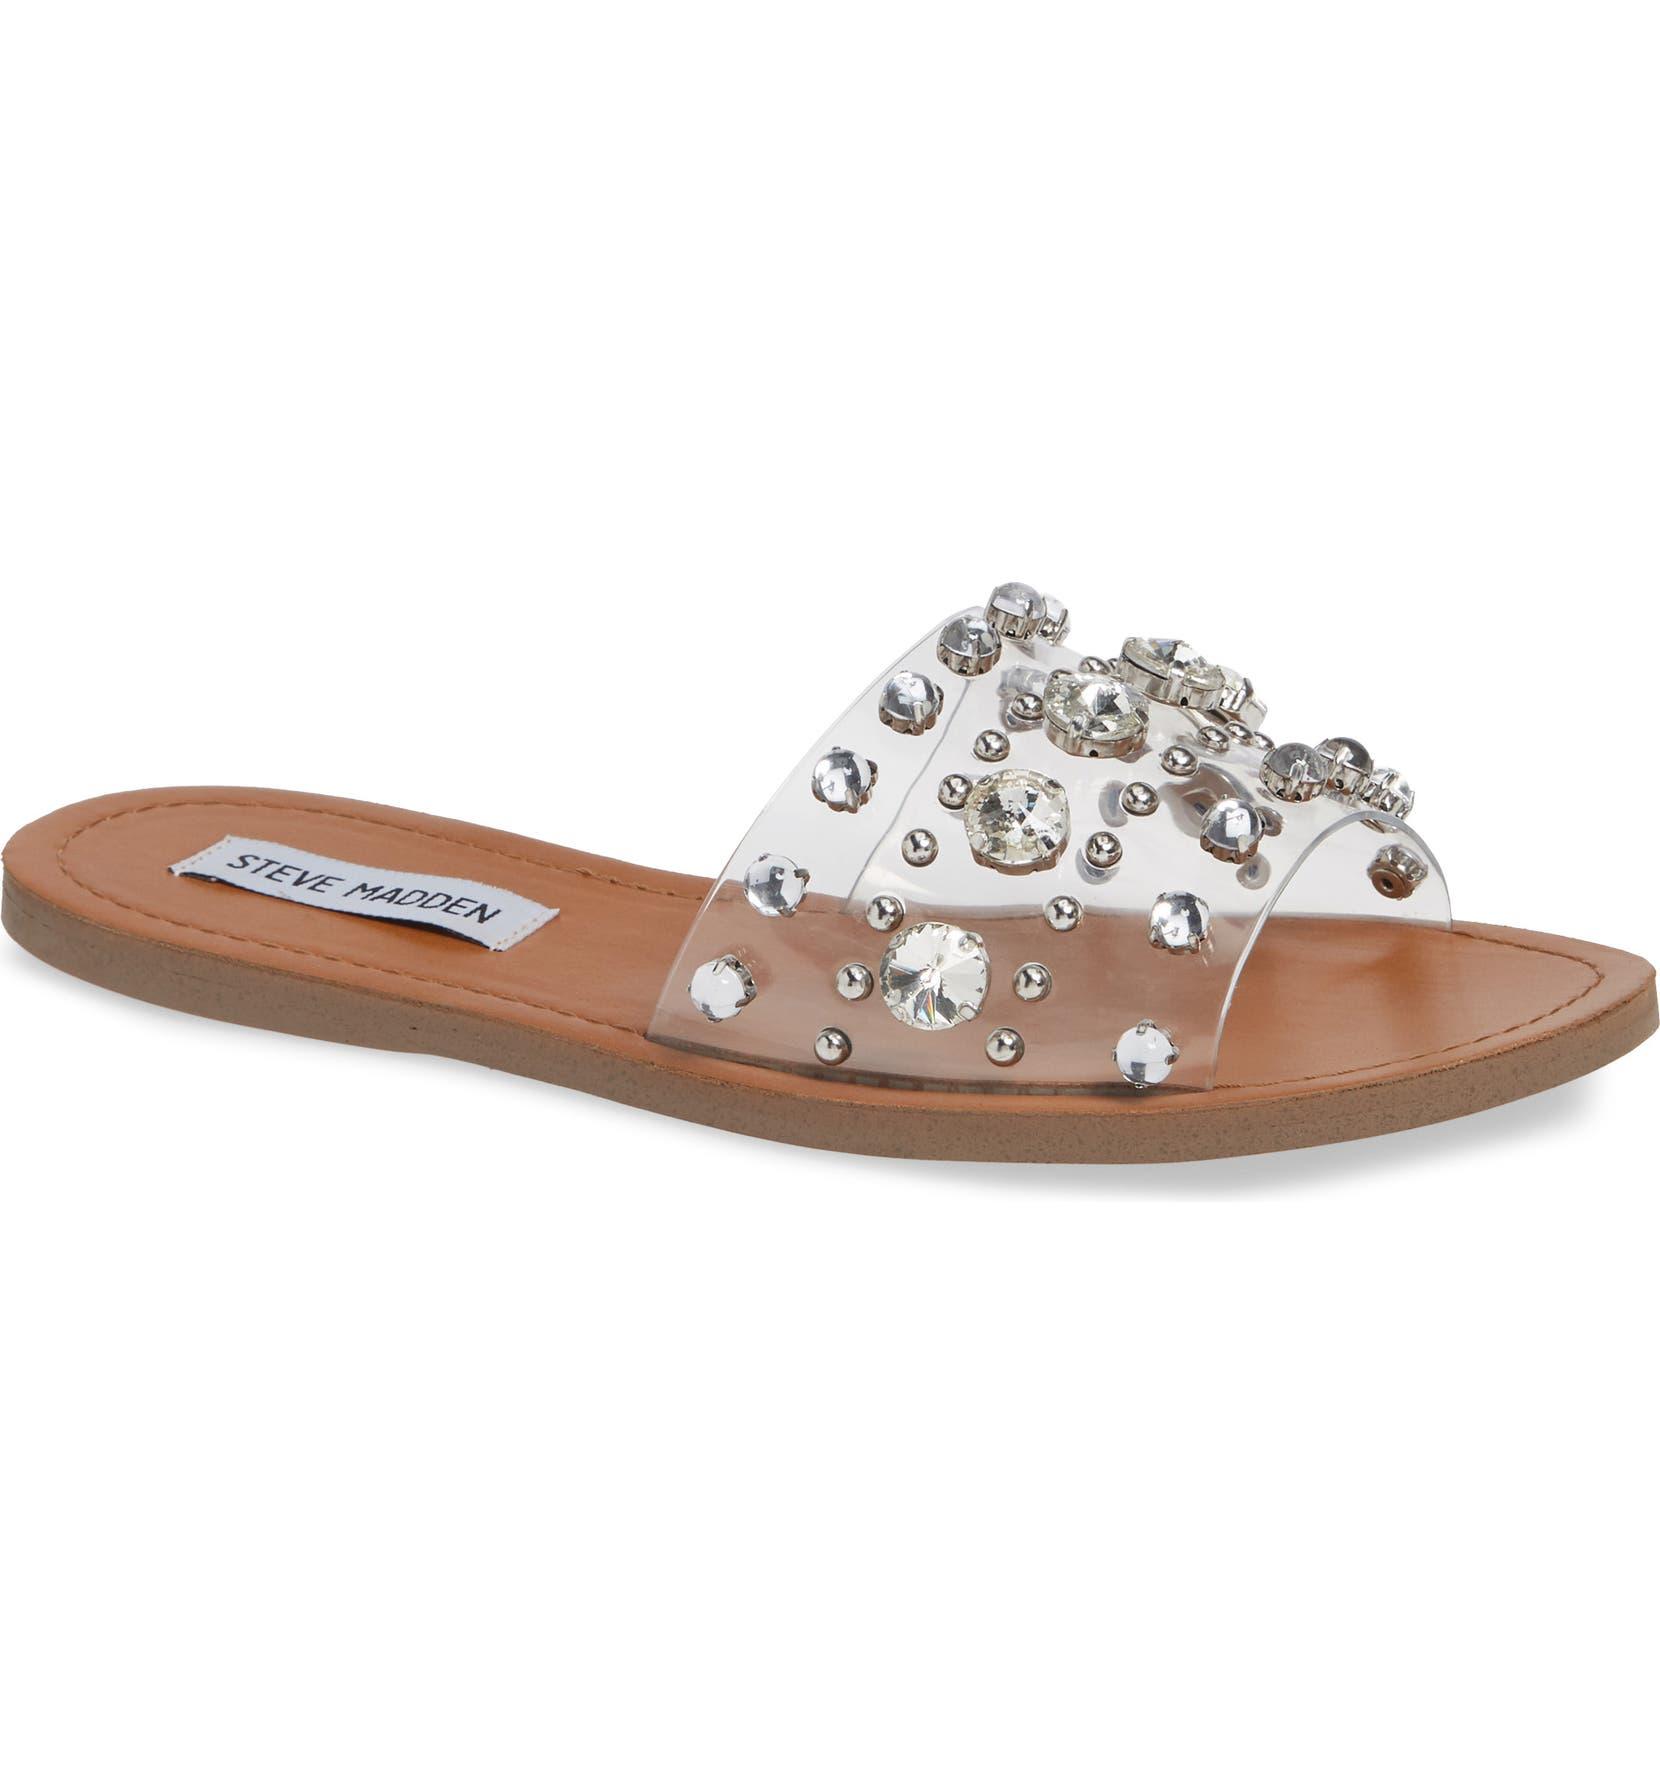 9f5abc10dbb Steve Madden Regent Embellished Slide Sandal (Women)